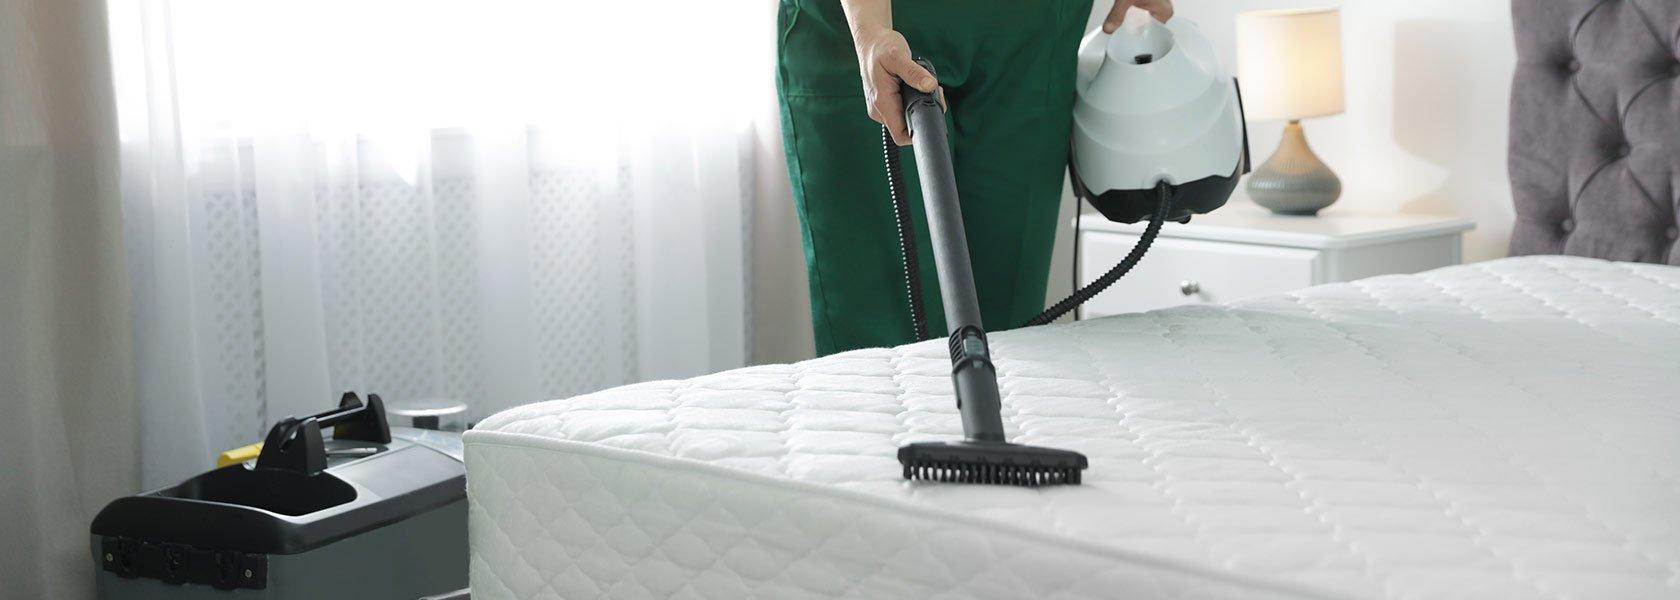 Mattress Cleaning Services in Dubai & Abu Dhabi